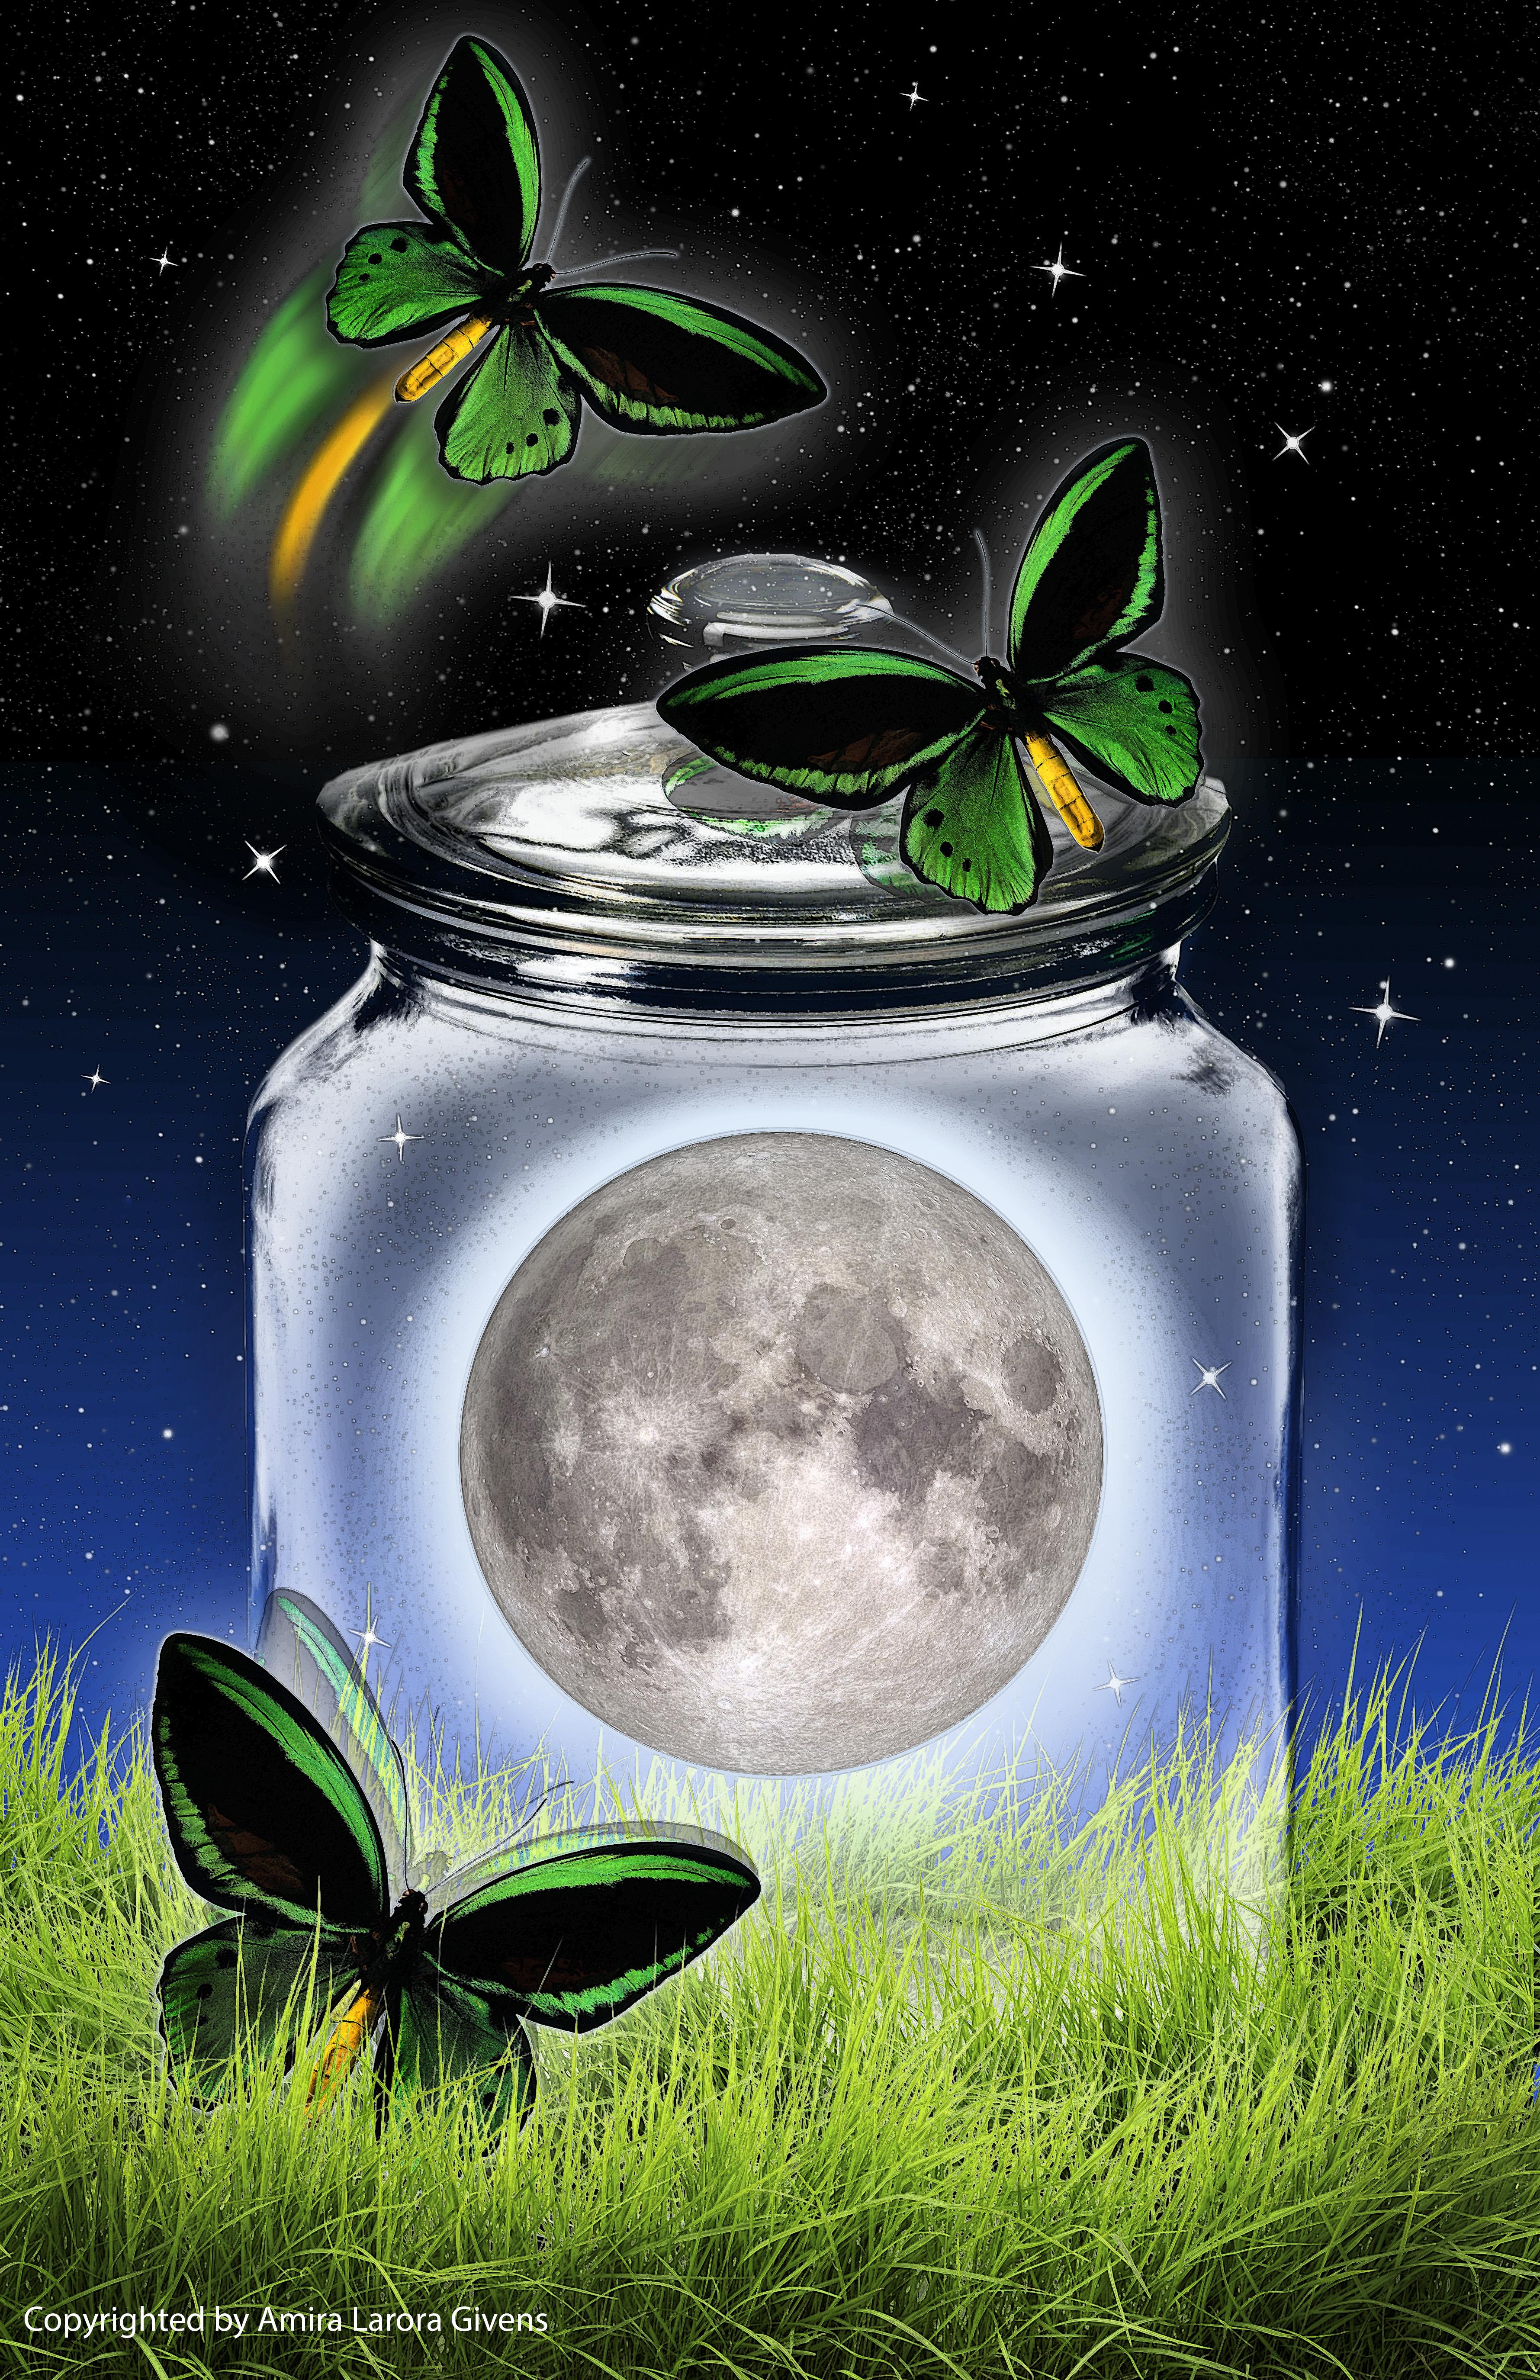 """ Moon in a Jar"" 2019"